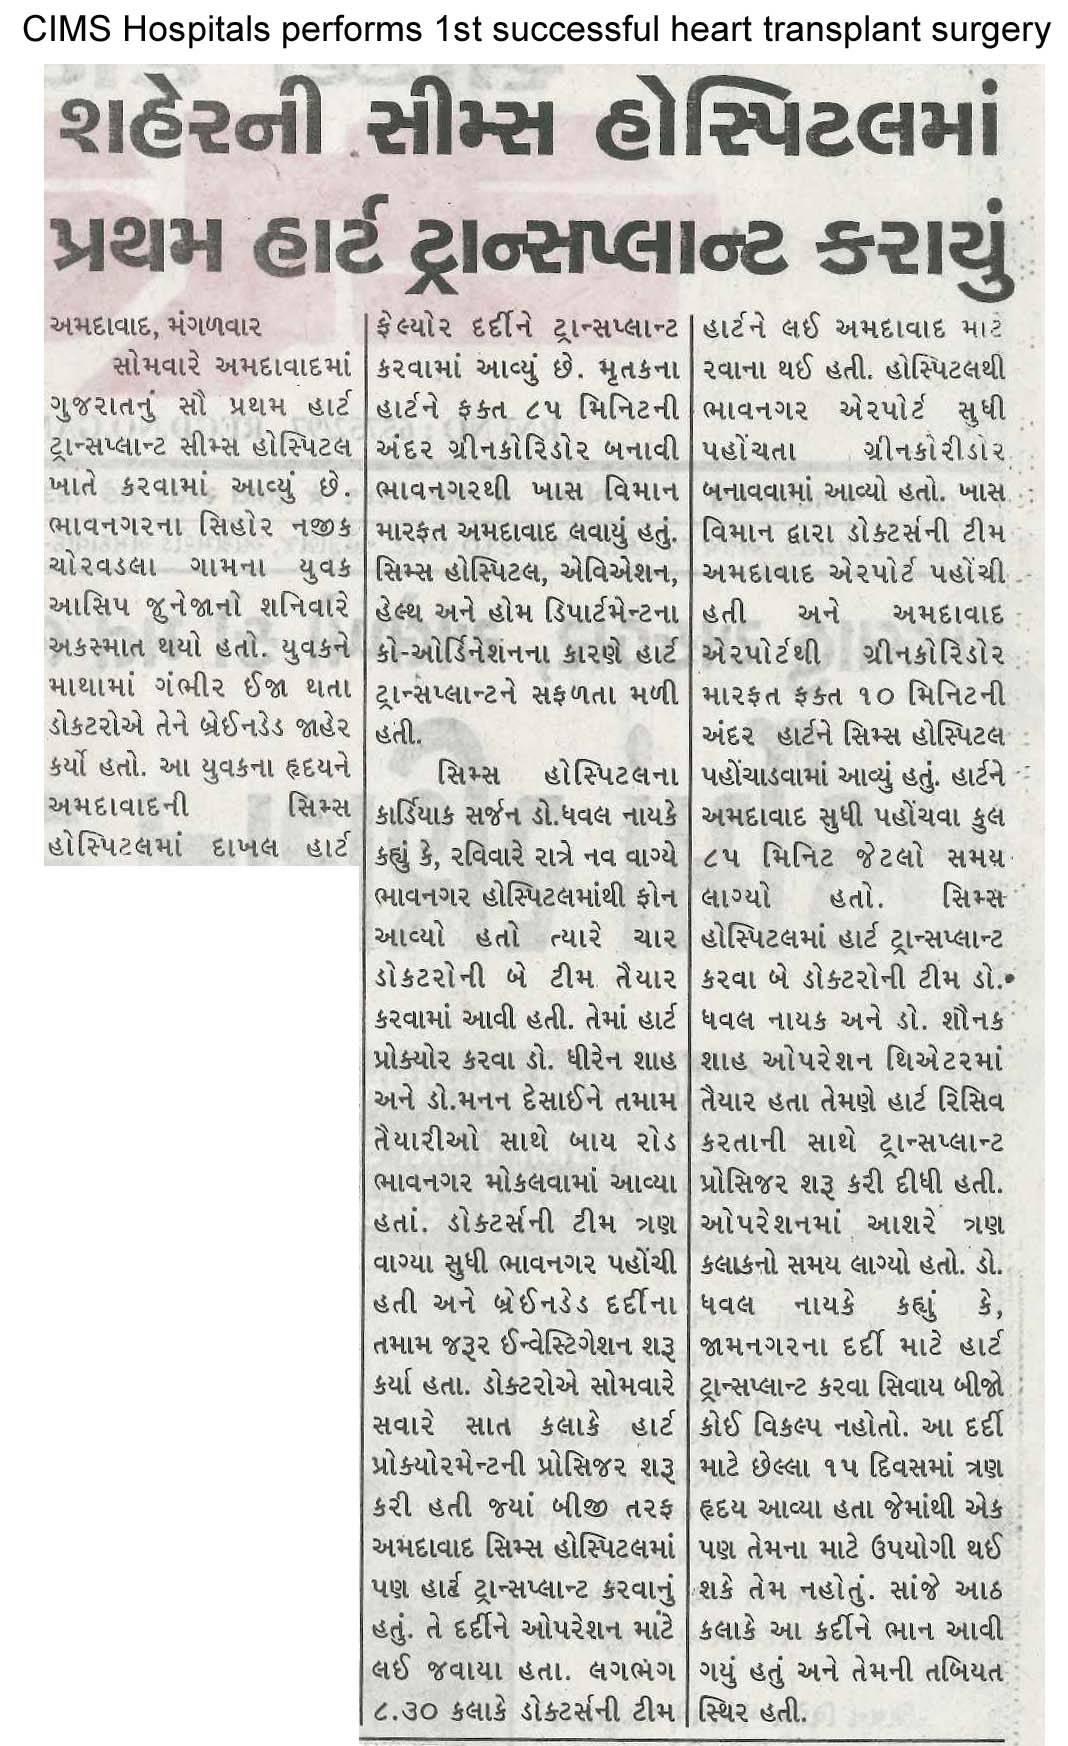 Suryakaal (Ahd)_CIMS (1st Heart transplant in Gujarat)_20.12.16_Pg 02